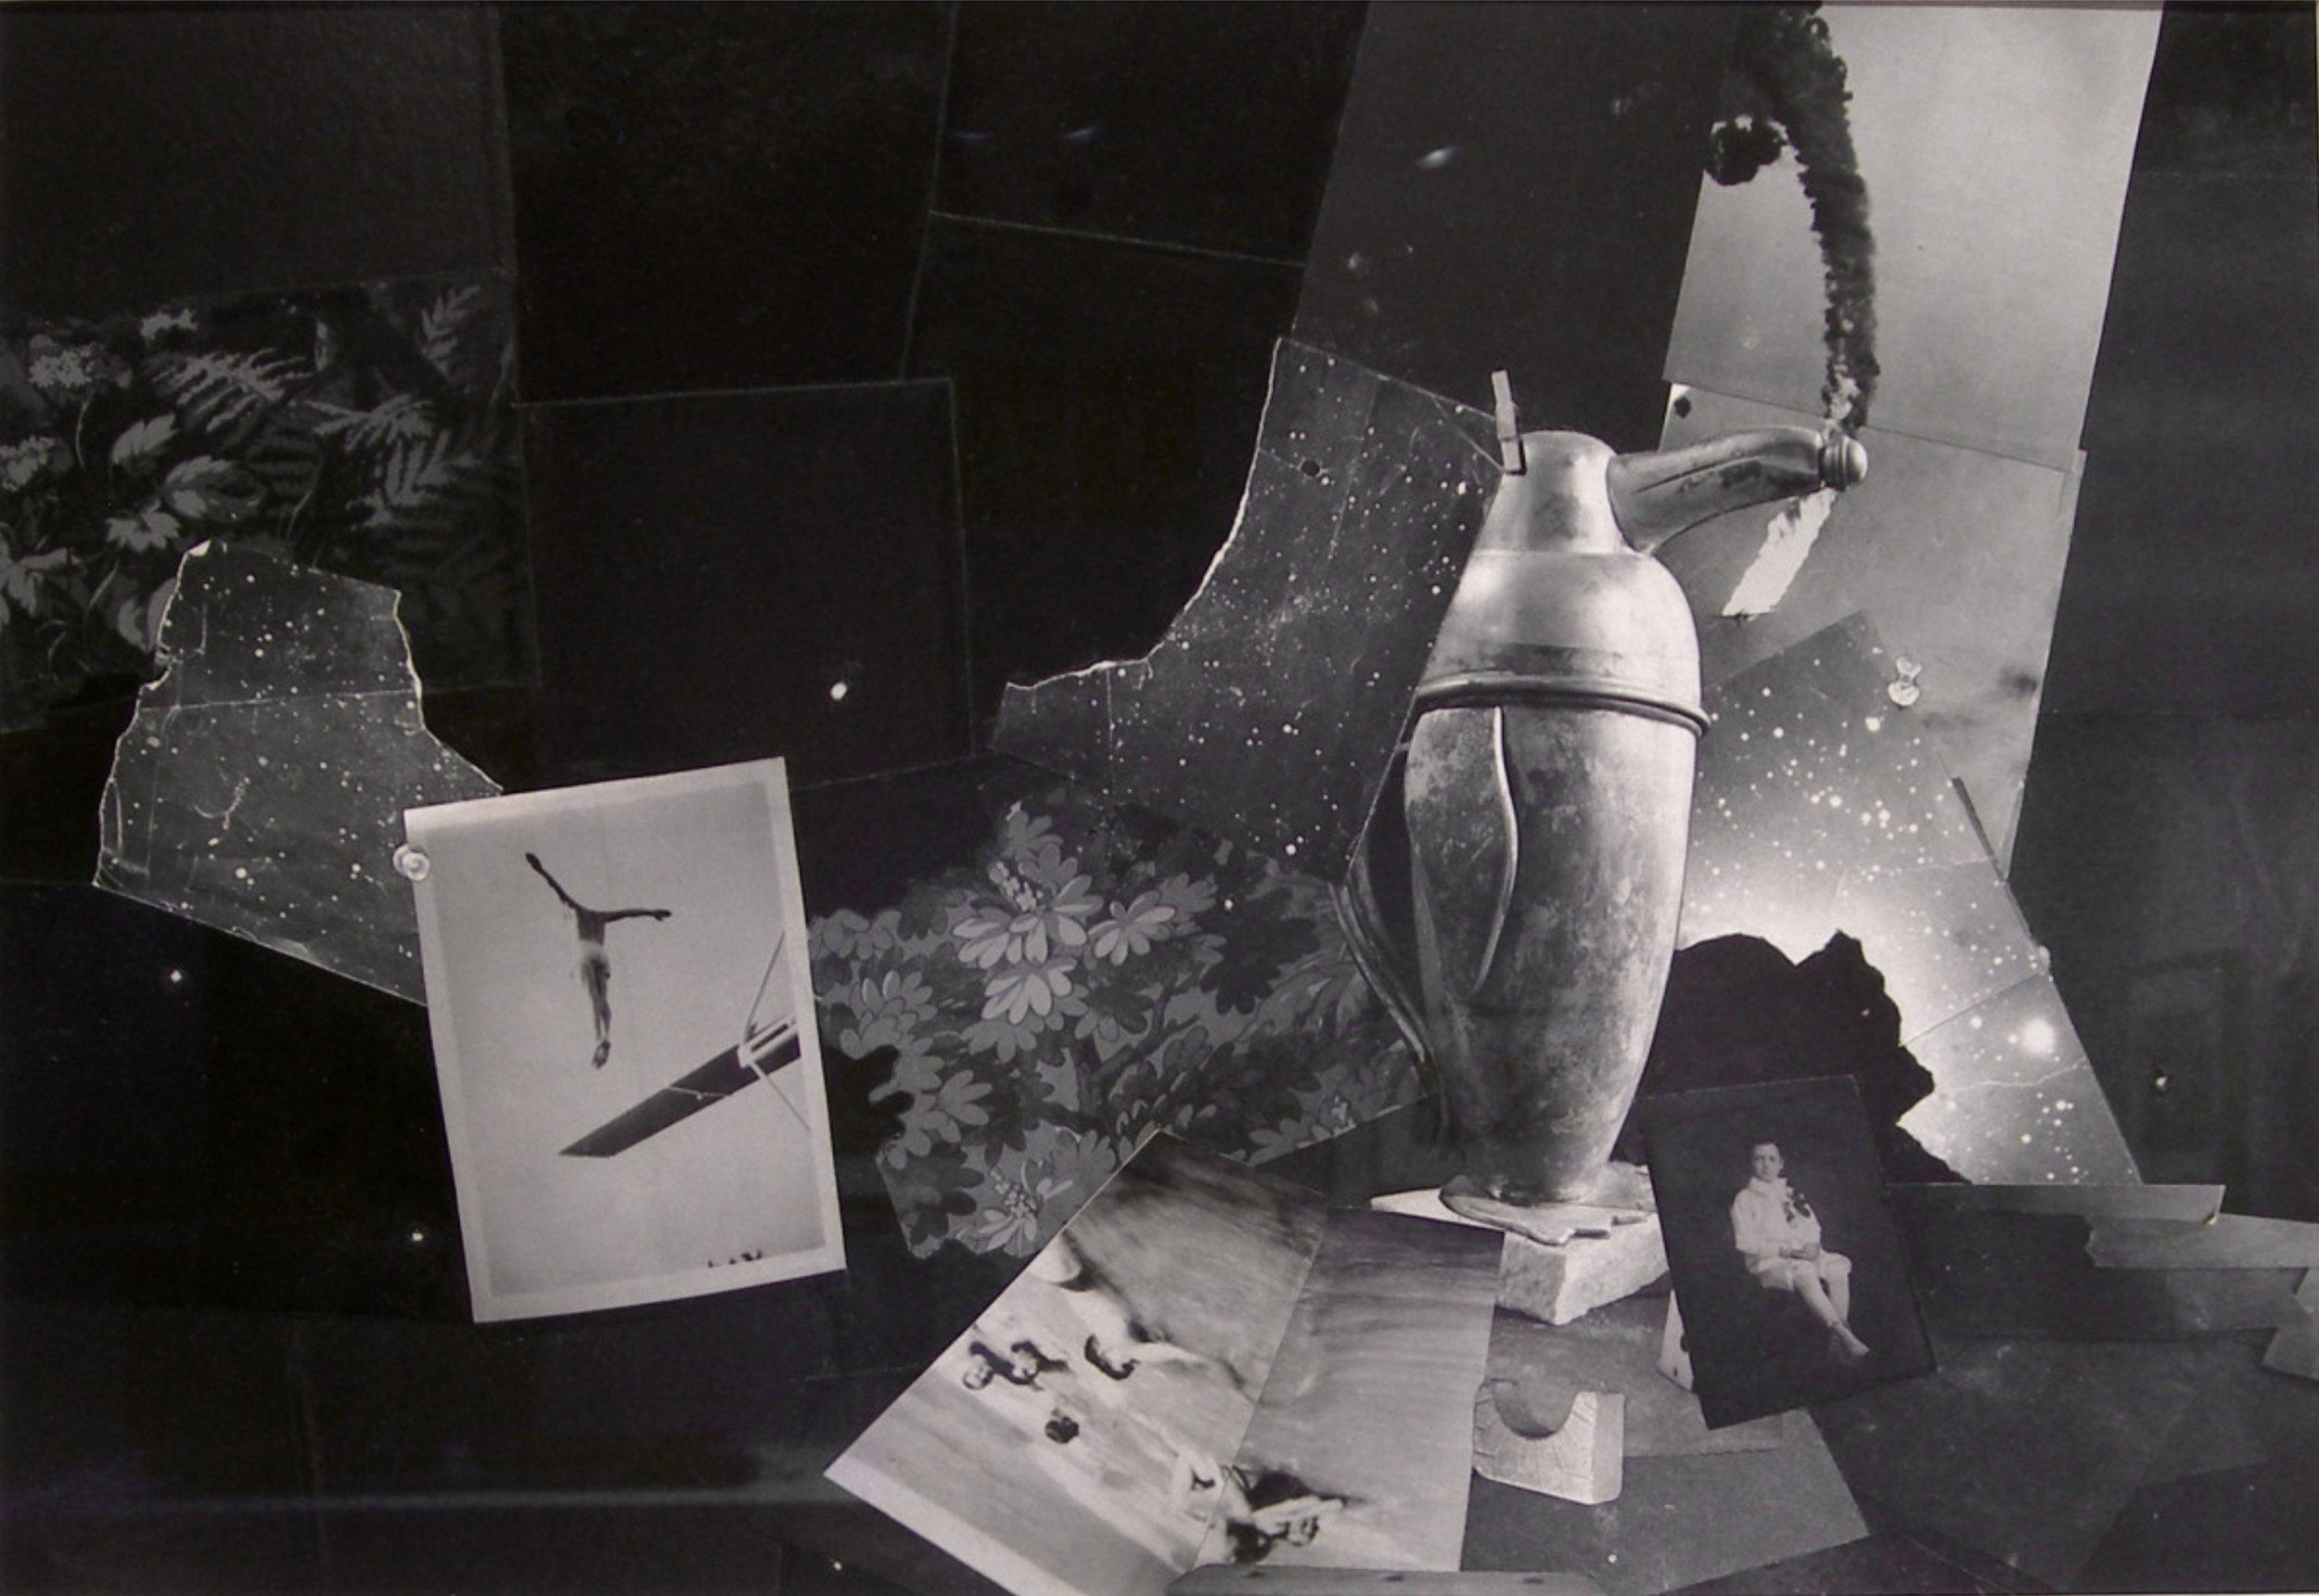 John O'Reilly   Nocturne #7 , 2006  polaroid montage  10.94h x 15.63w in